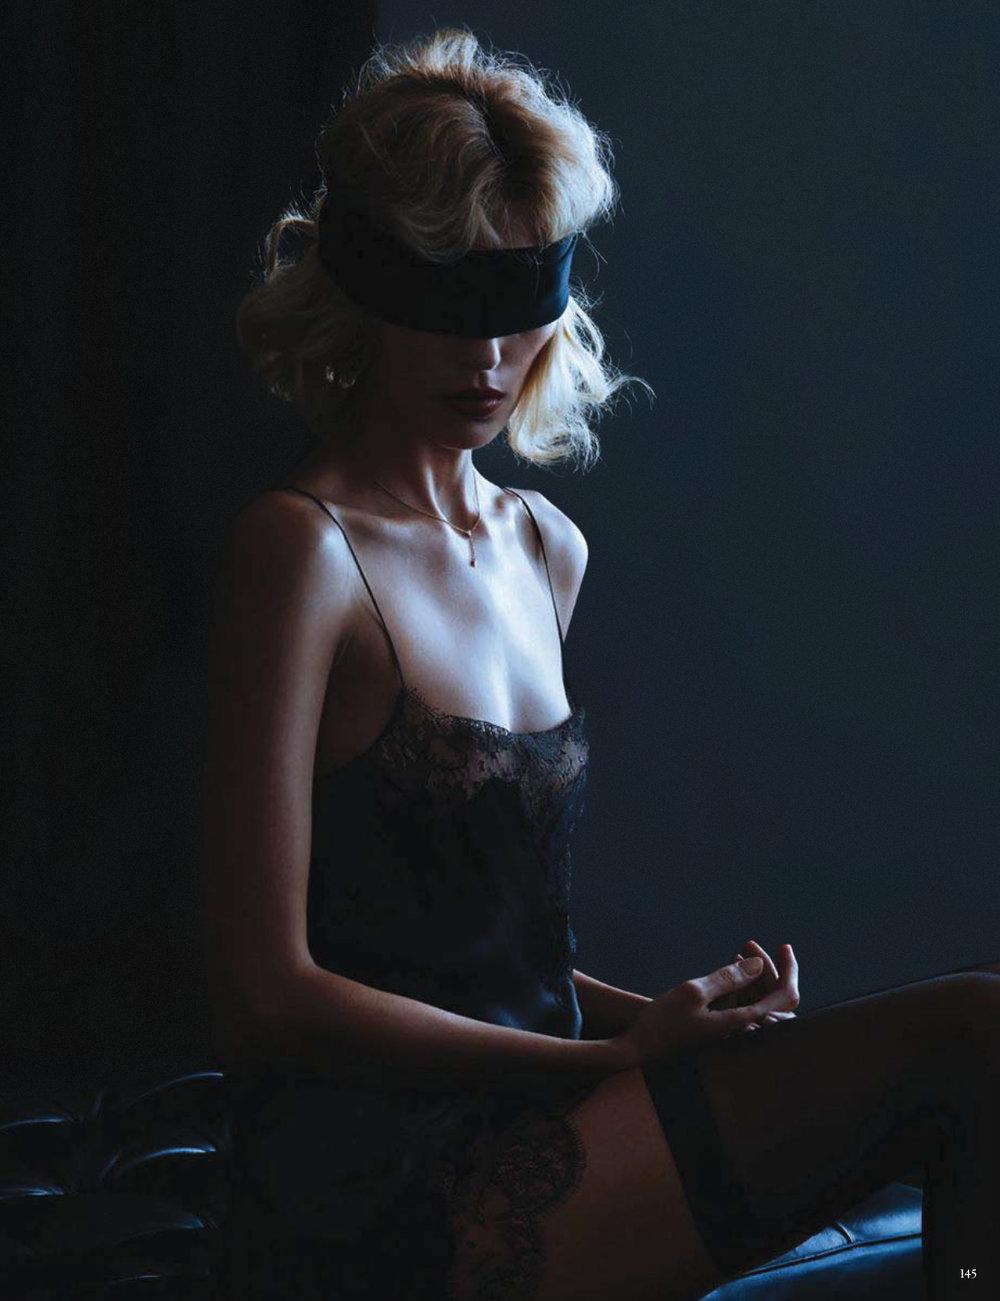 Anja-Rubik-Passion-by-Camilla-Akrans-For-Vogue-Germany-16.jpg